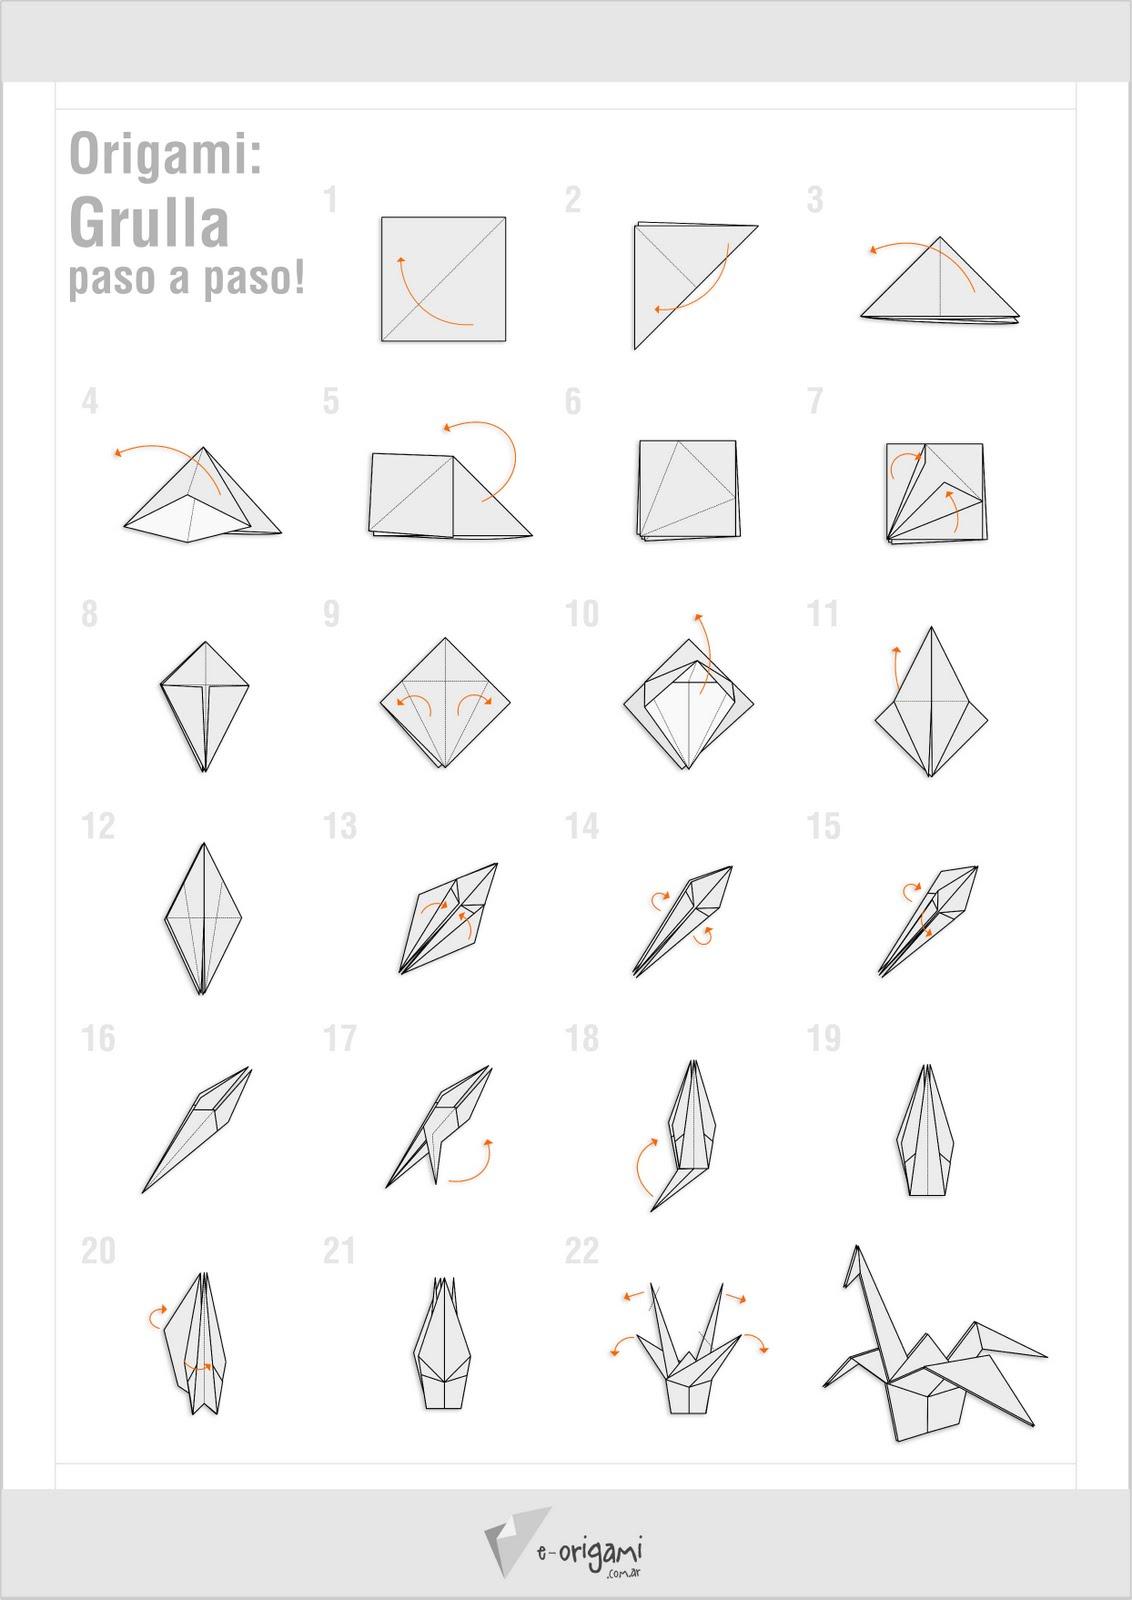 BlogFer: Origami: Grulla paso a paso